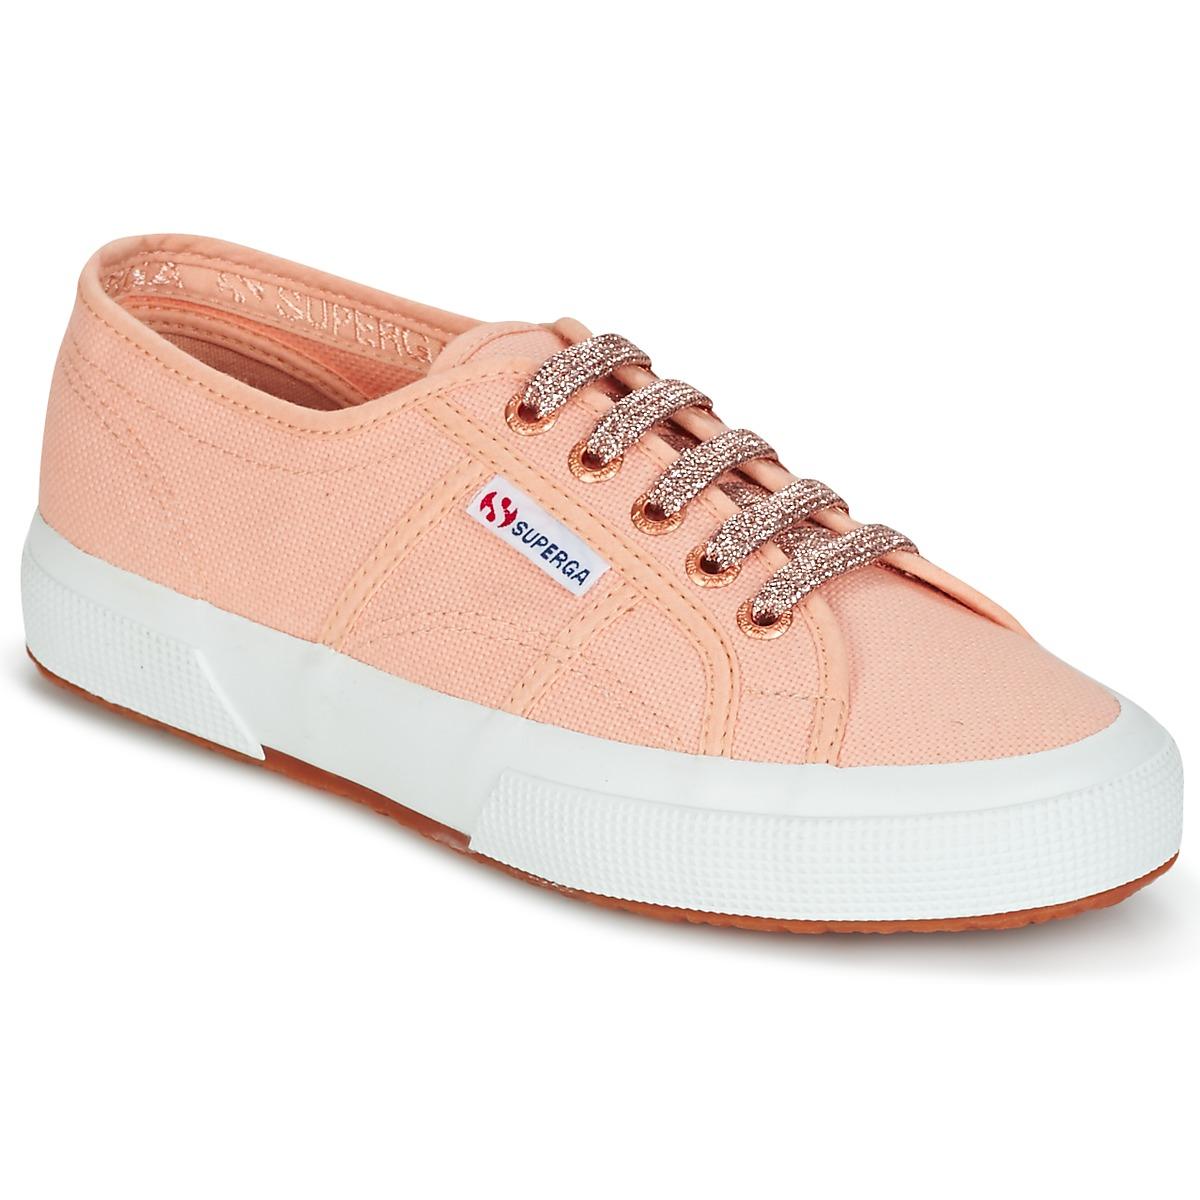 Superga 2750 CLASSIC SUPER GIRL EXCLUSIVE Pfirsisch - Kostenloser Versand bei Spartoode ! - Schuhe Sneaker Low Damen 48,99 €